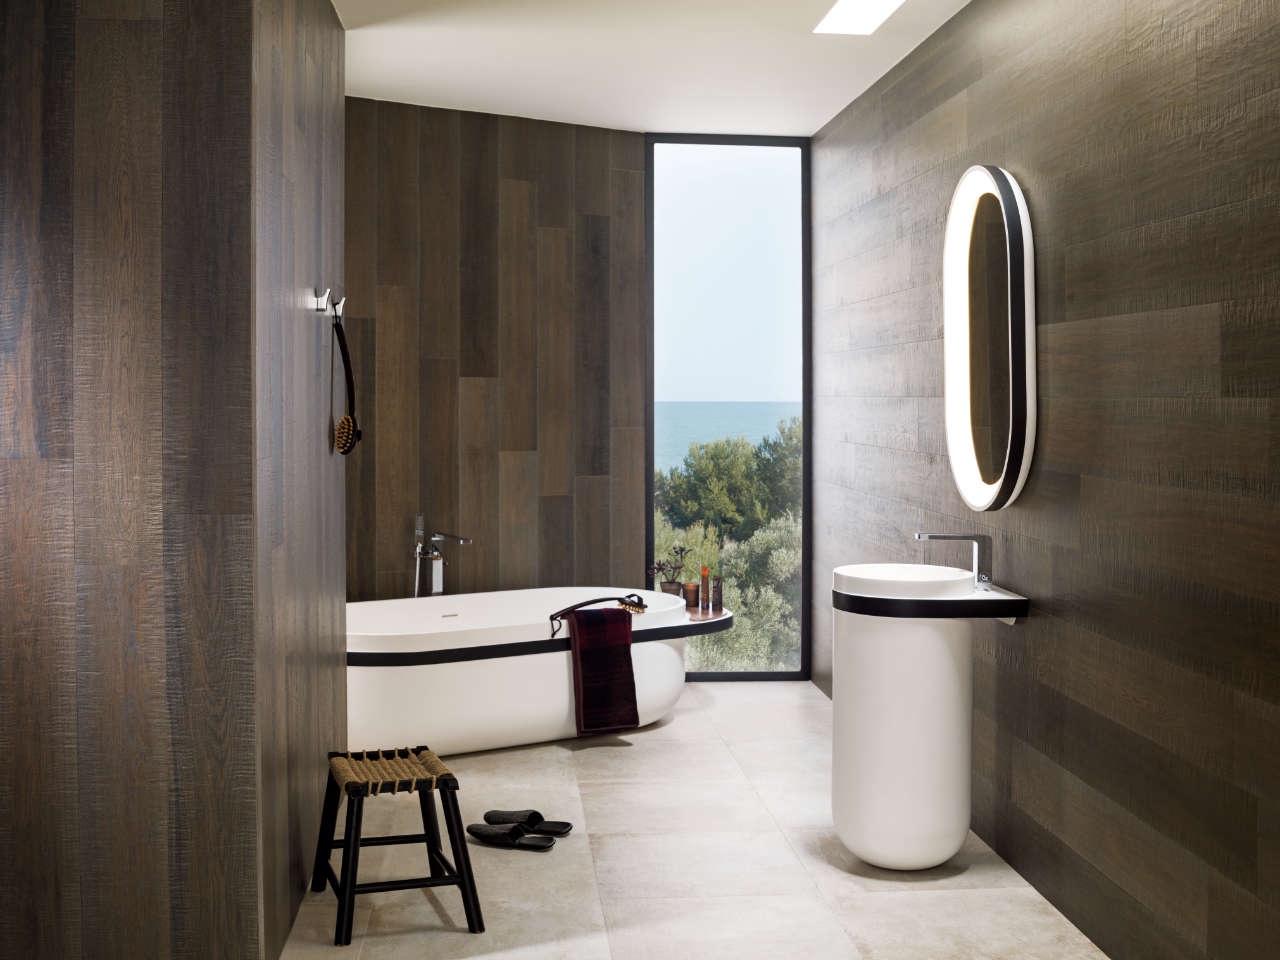 Systempool-Porcelanosa-KRION-bathroom-Aro-nogal-2